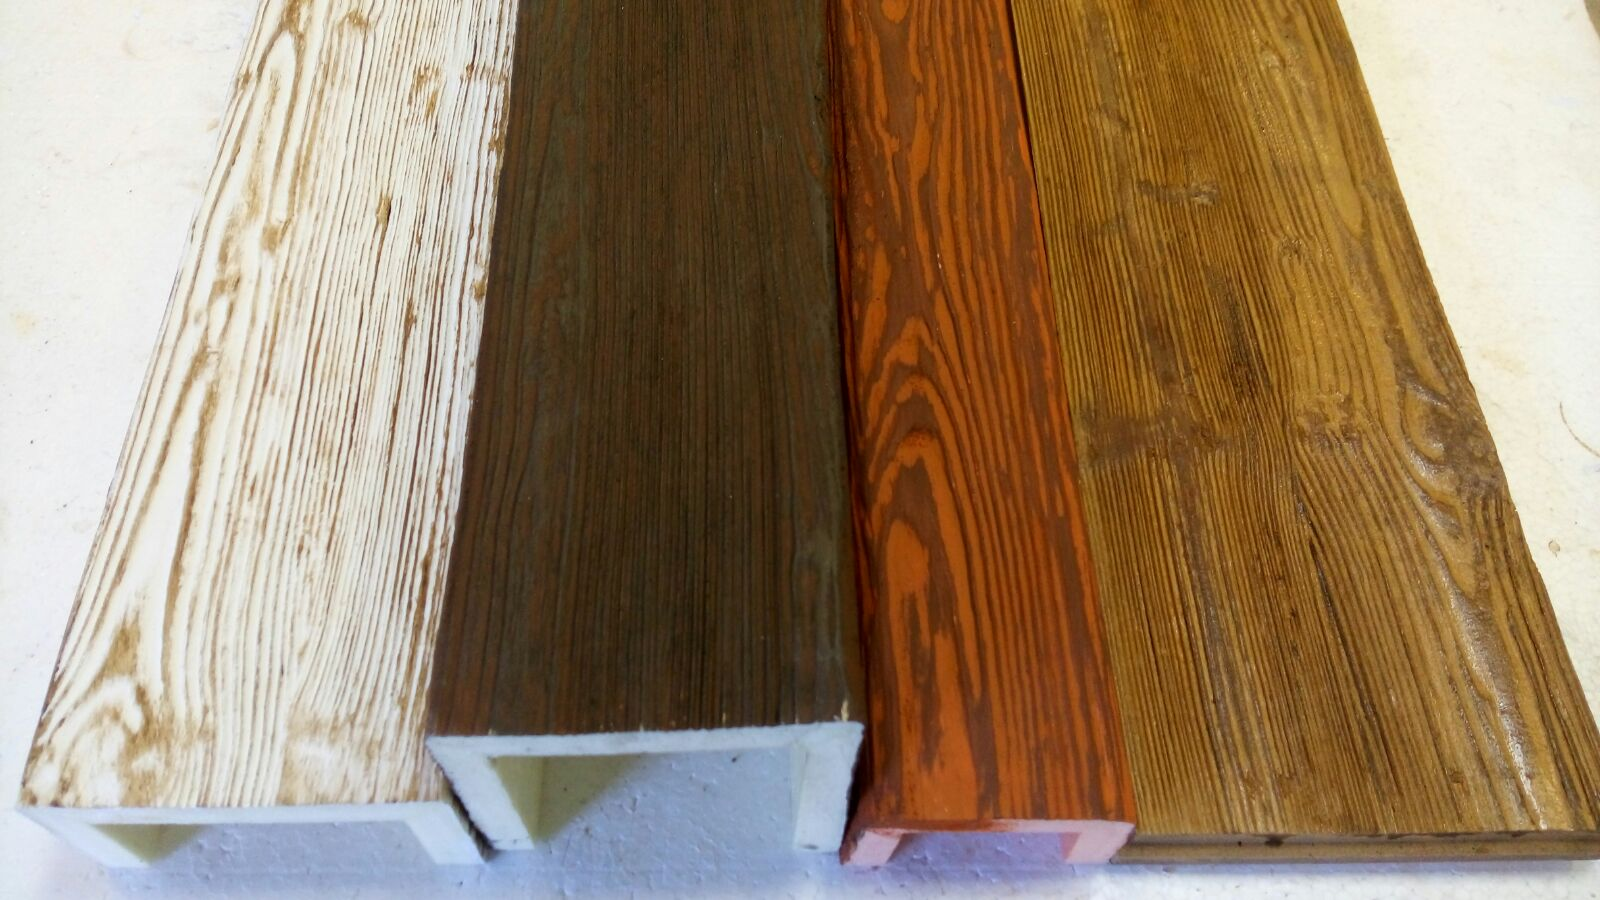 Vigas de poliuretano huecas materiales de construcci n - Vigas falsas de madera ...